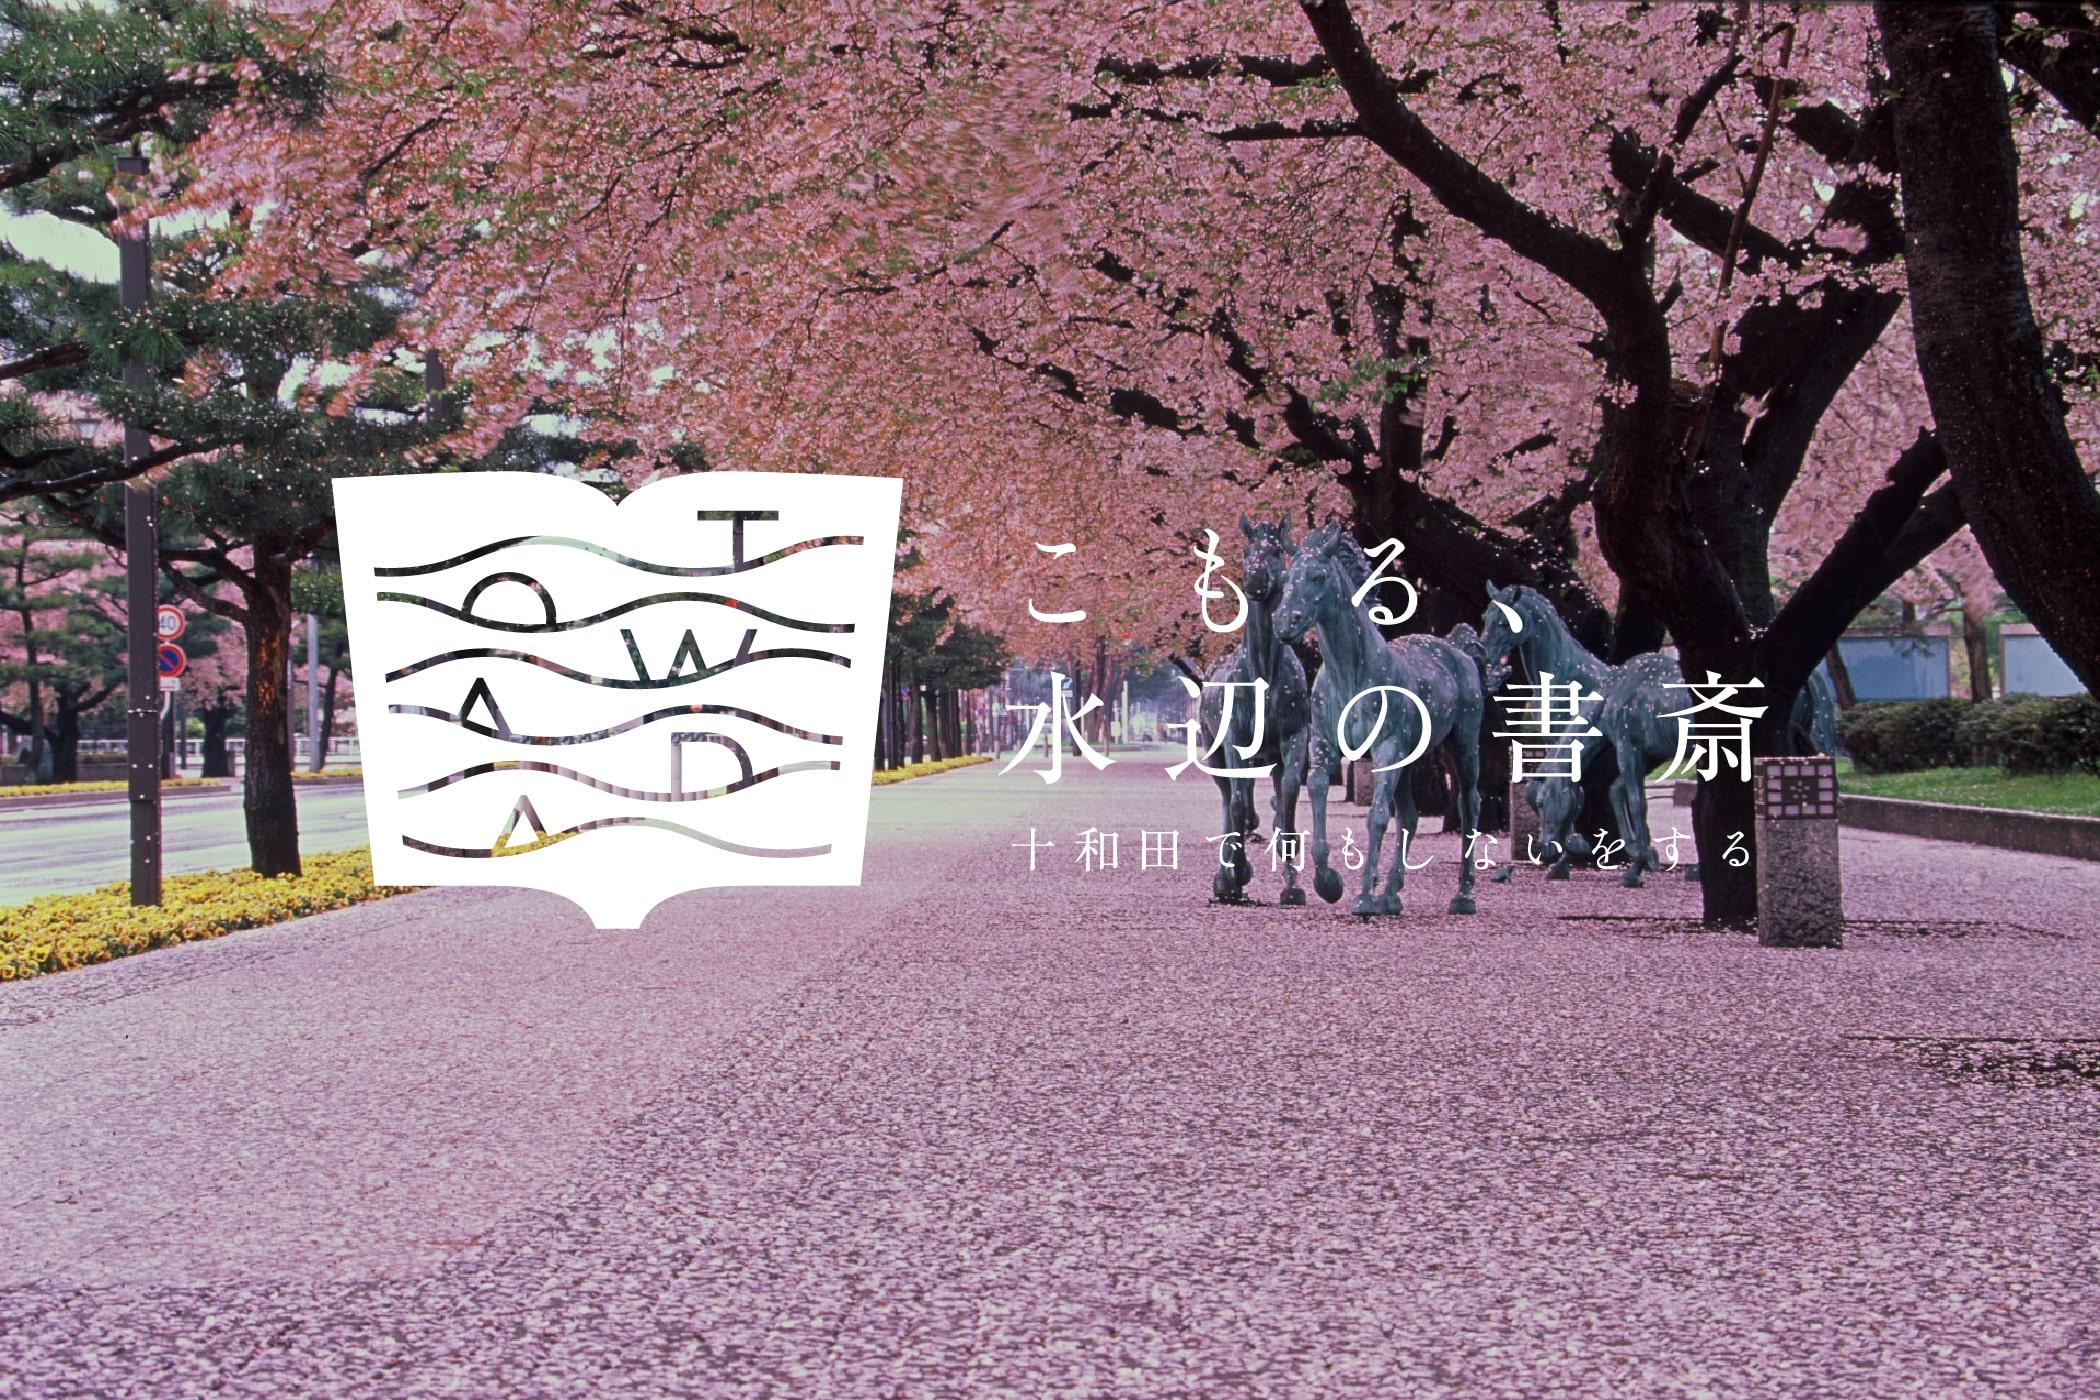 A06官庁街 春0004s-min copy (2019-08-09)-min.jpg